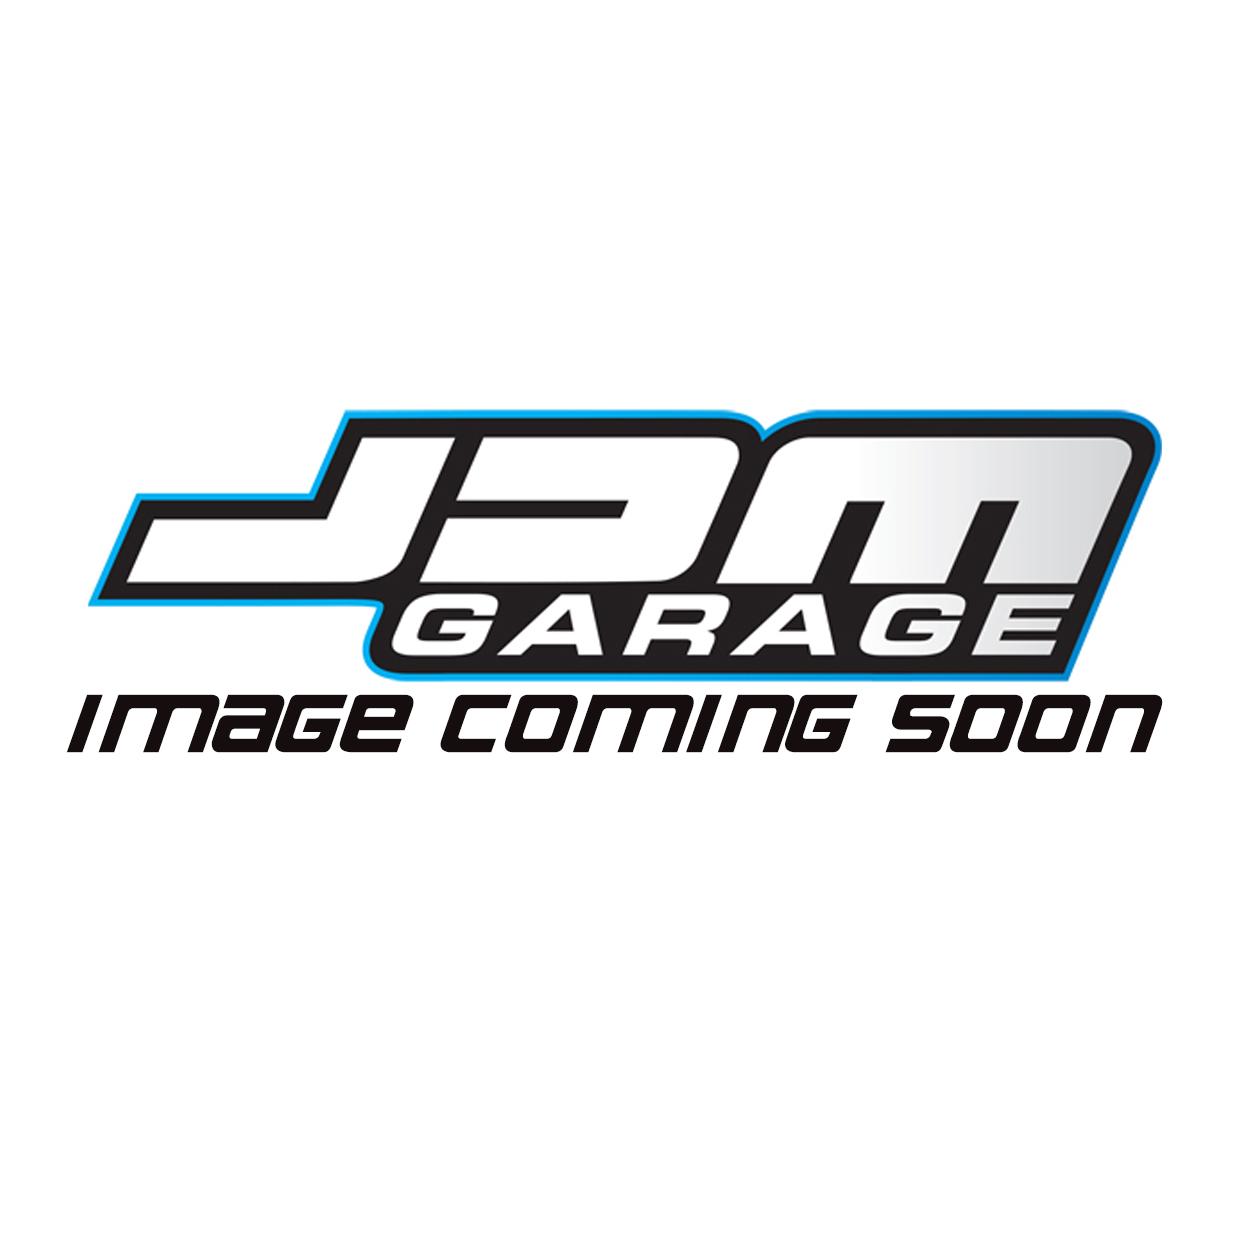 OE Genuine Toyota Engine Rebuild Gasket Set 2JZ GTE NON-VVTI 04111-46094